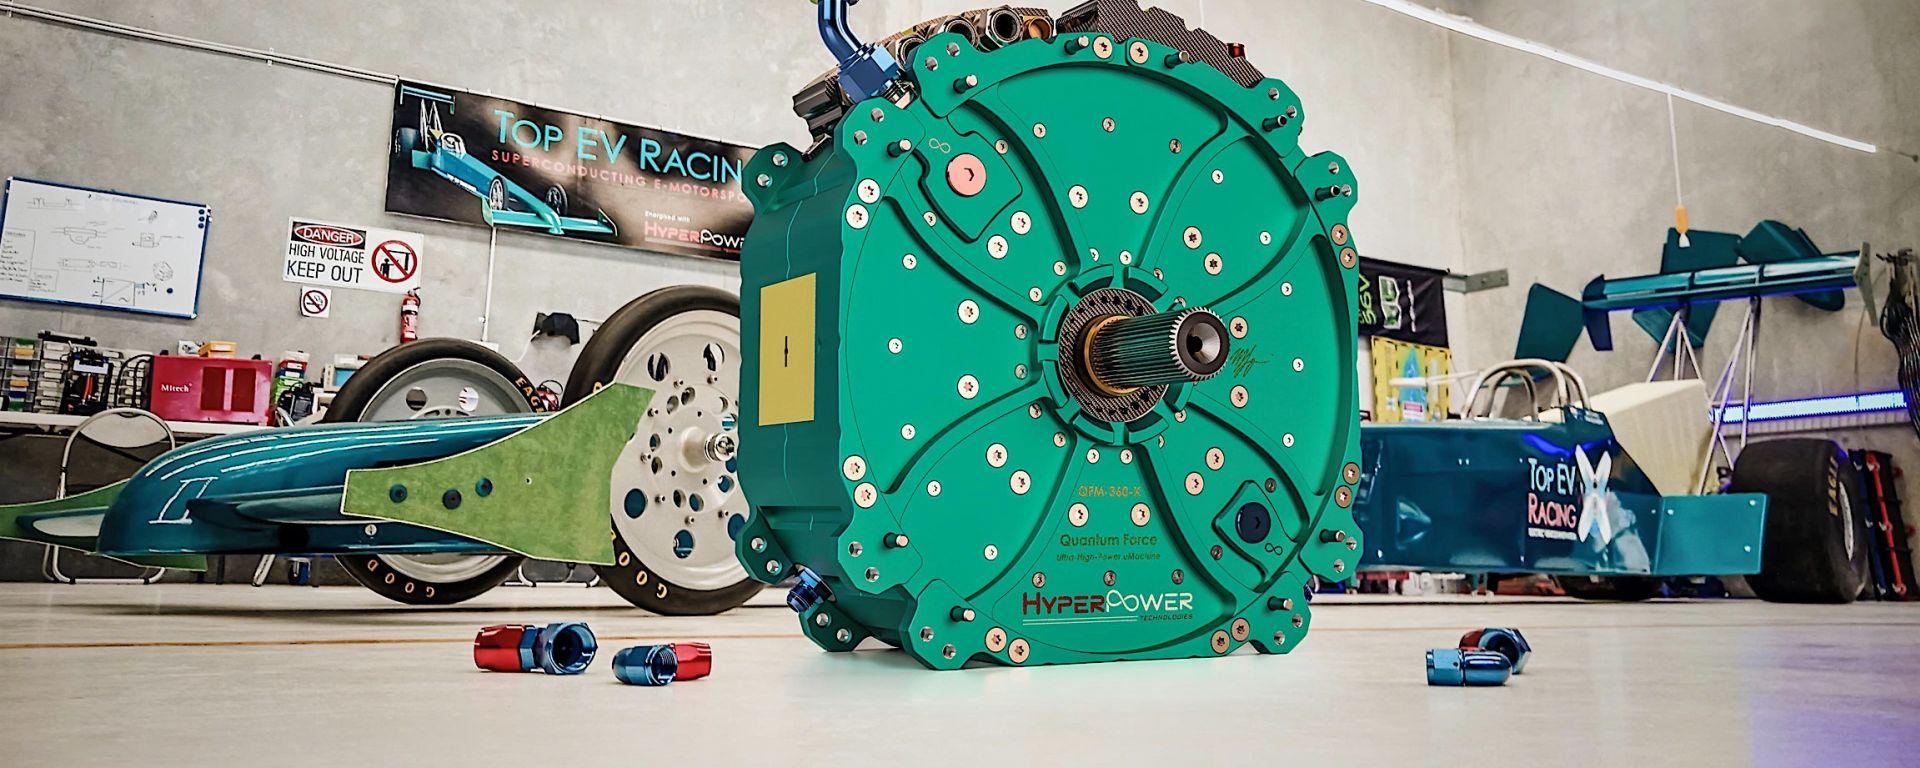 HyperPower Technologies, motore elettrico da 1.340 cv